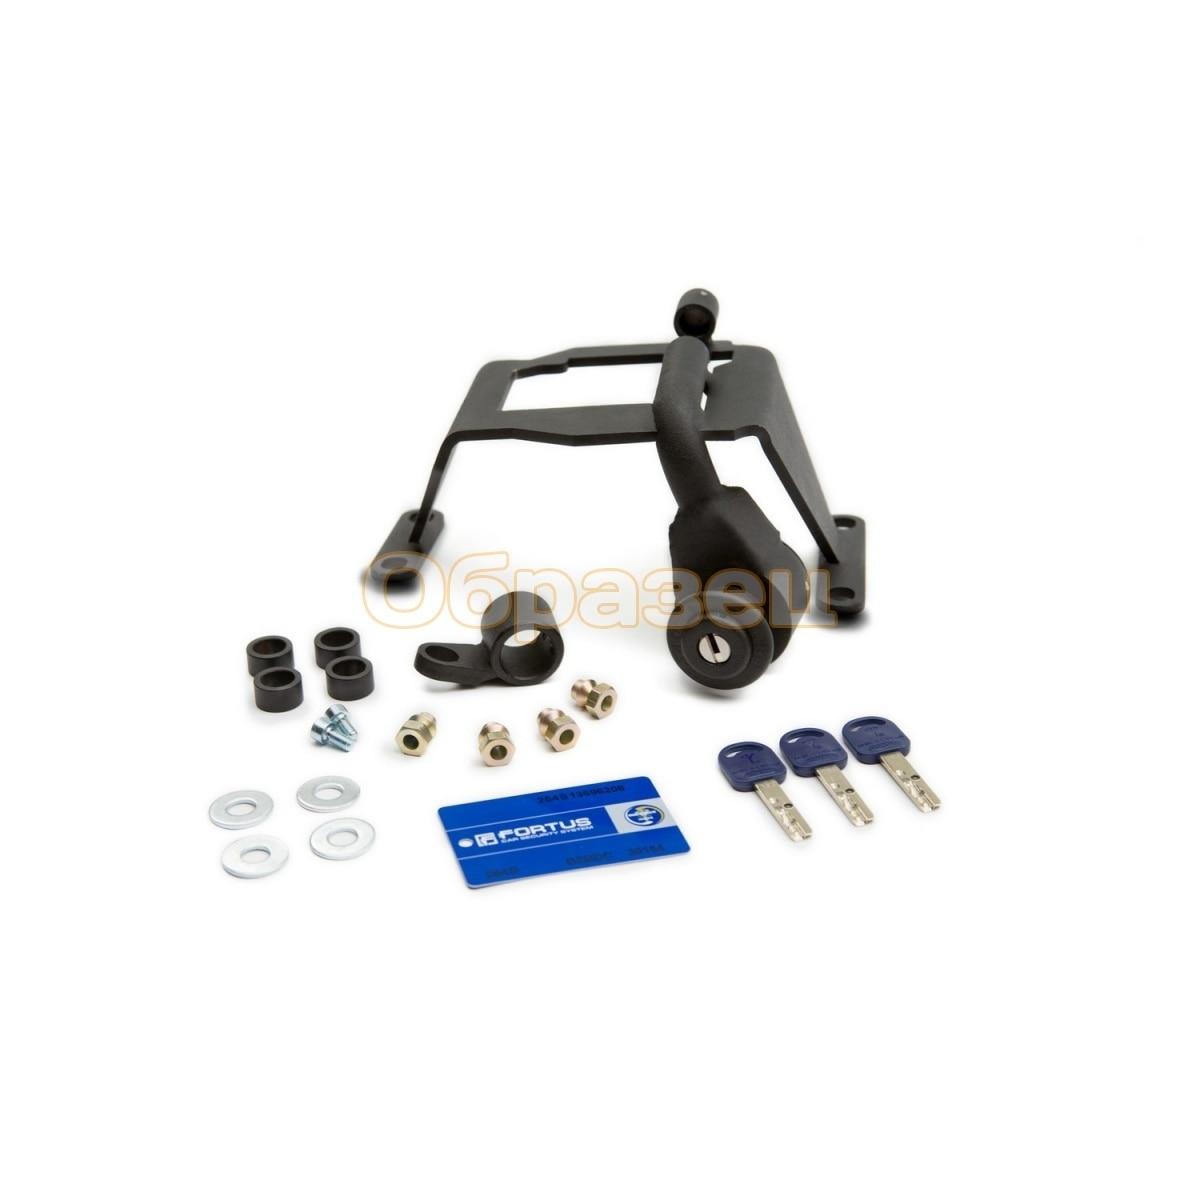 Gearbox lock (MTL) 2266a INT for UAZ Patriot 2014 2016  5MT (UAZ Patriot) Car Steering Wheel Lock     - title=